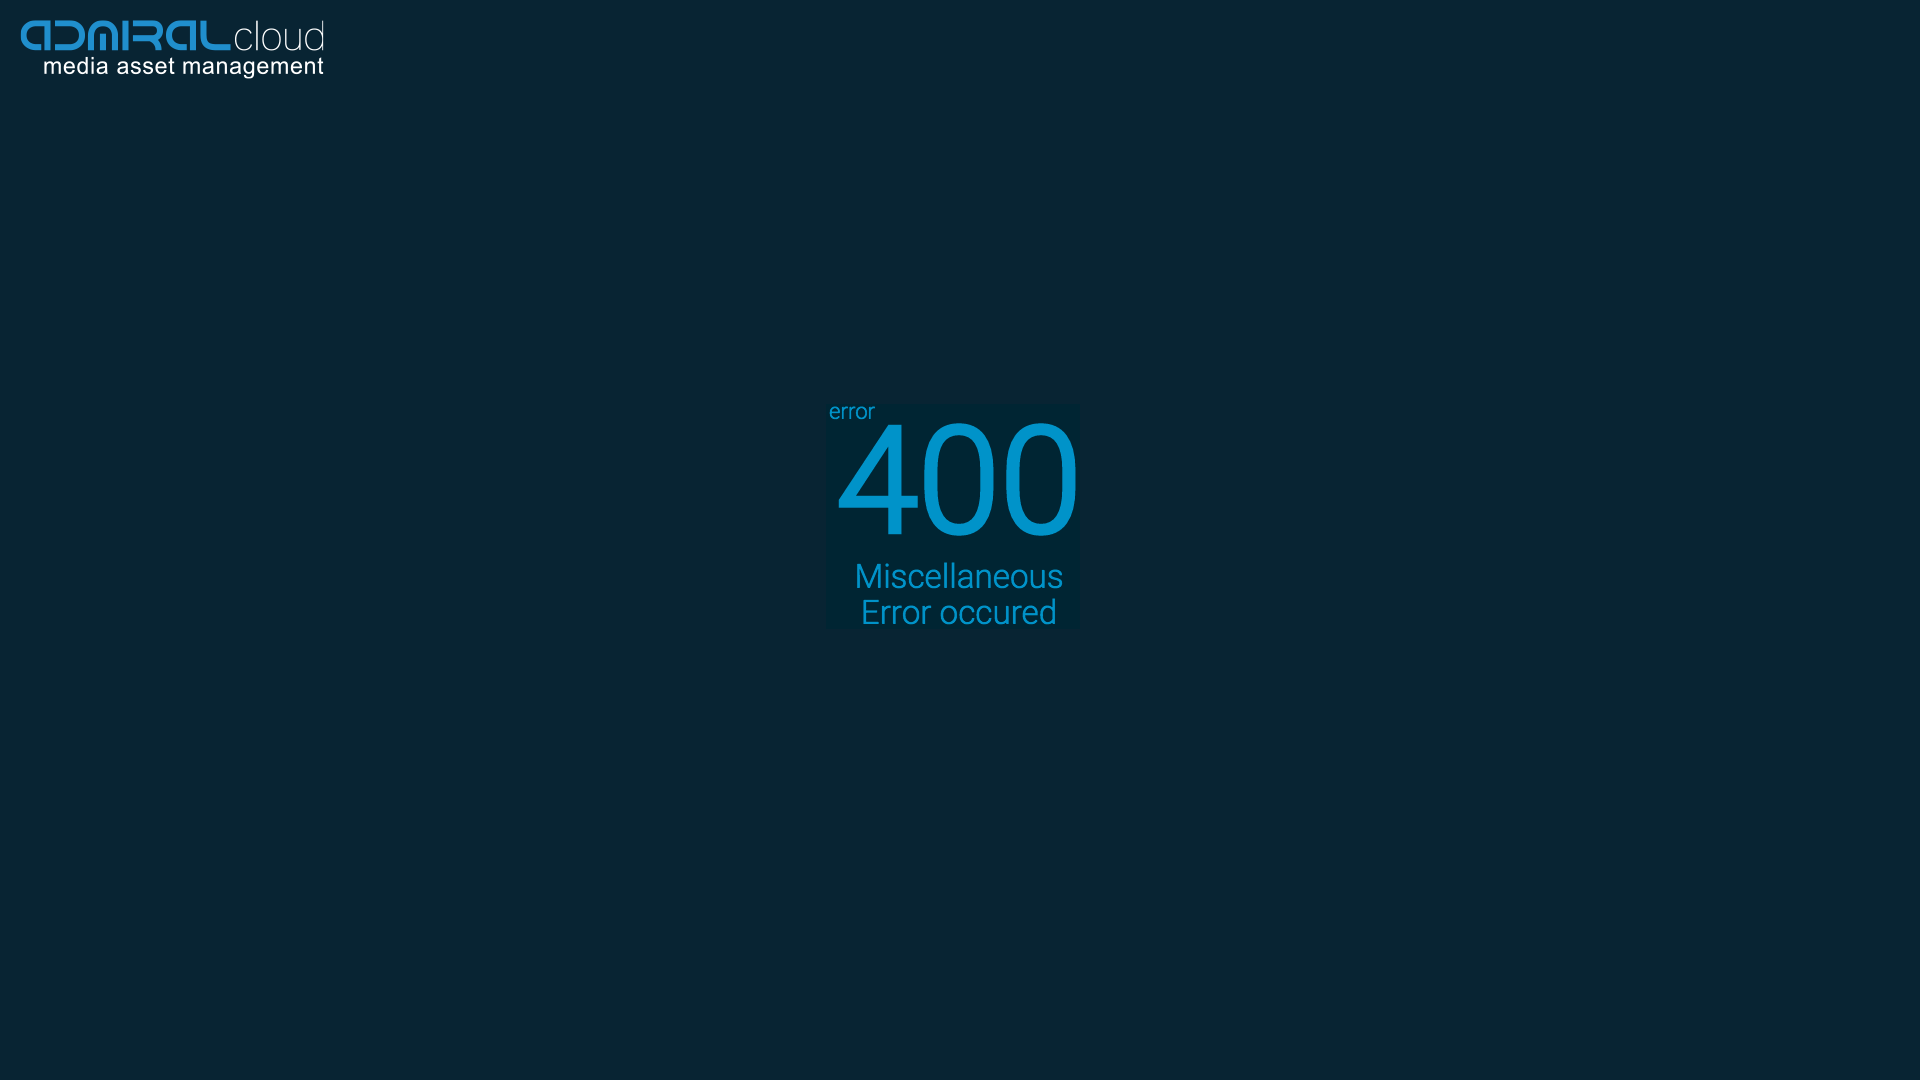 Half-Year 2020 Financial Results